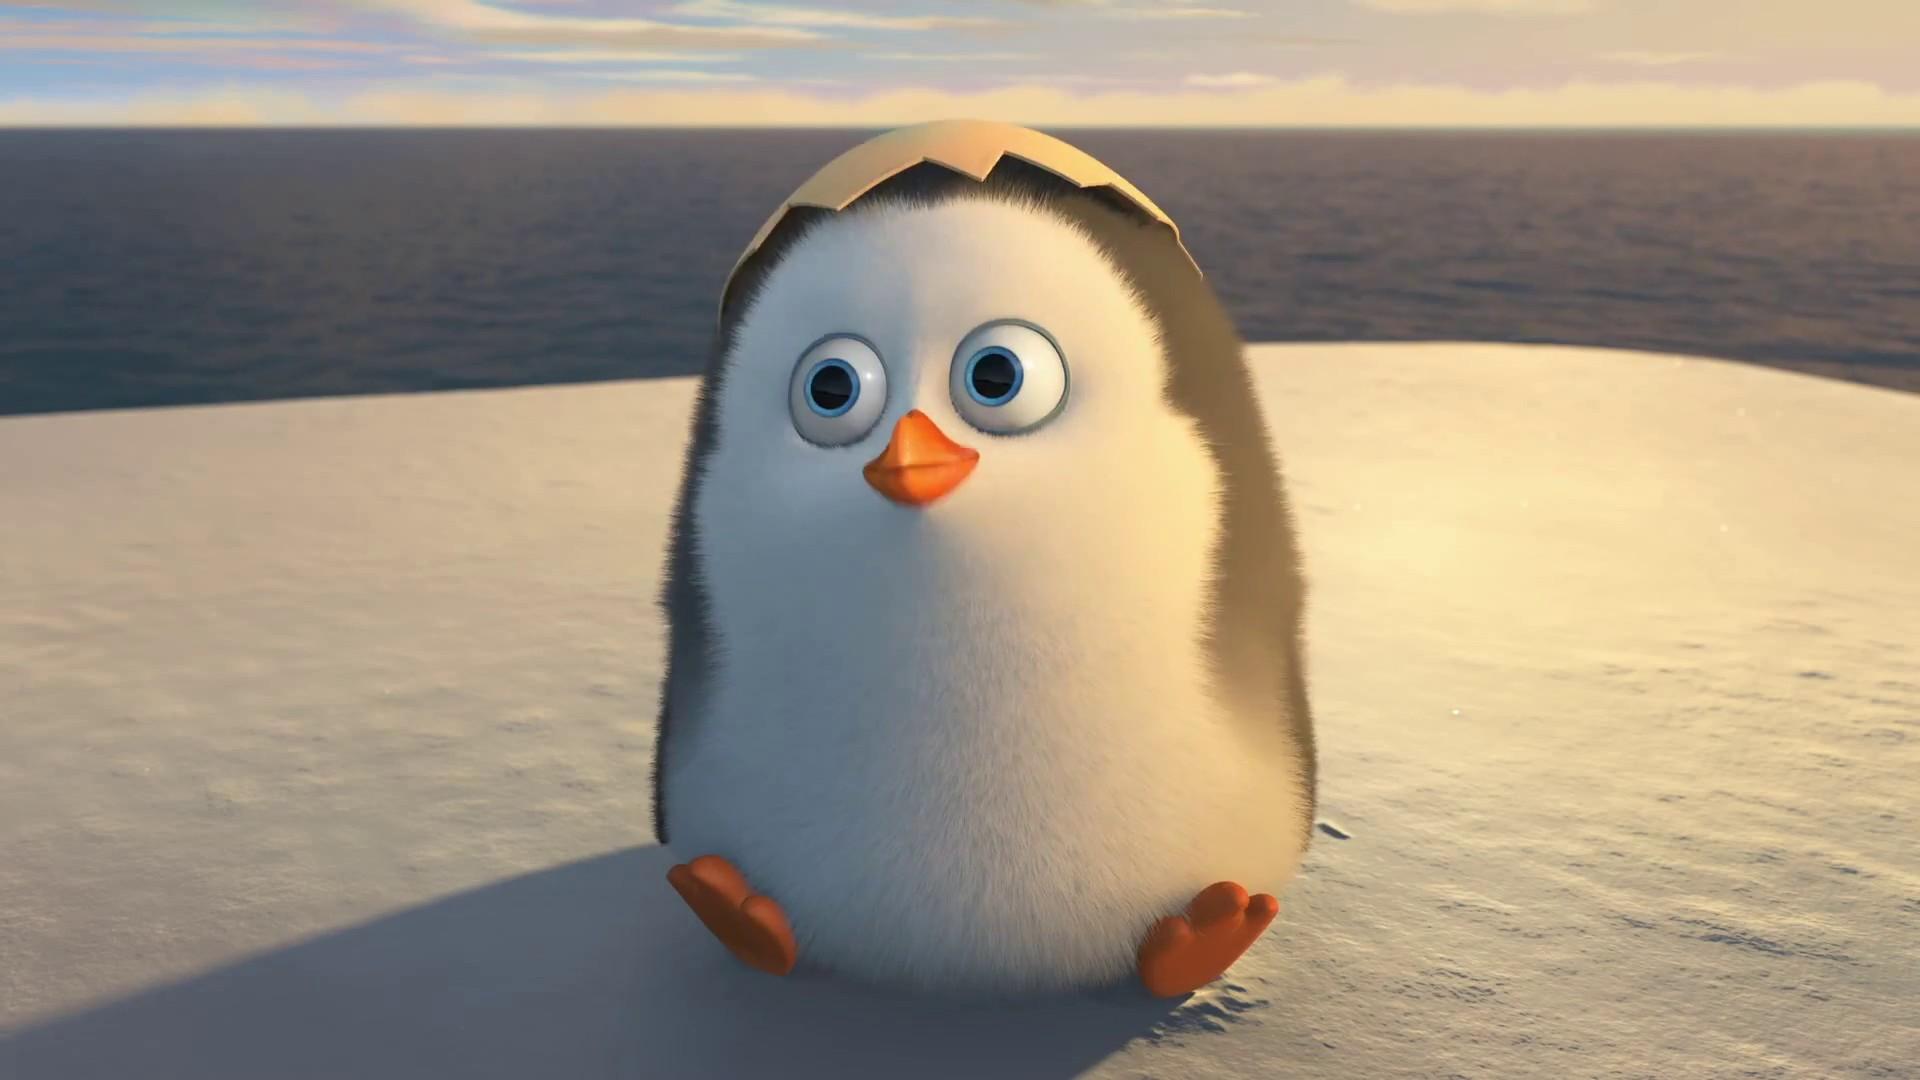 Cute Baby Penguins wallpaper 1920x1080 45962 1920x1080